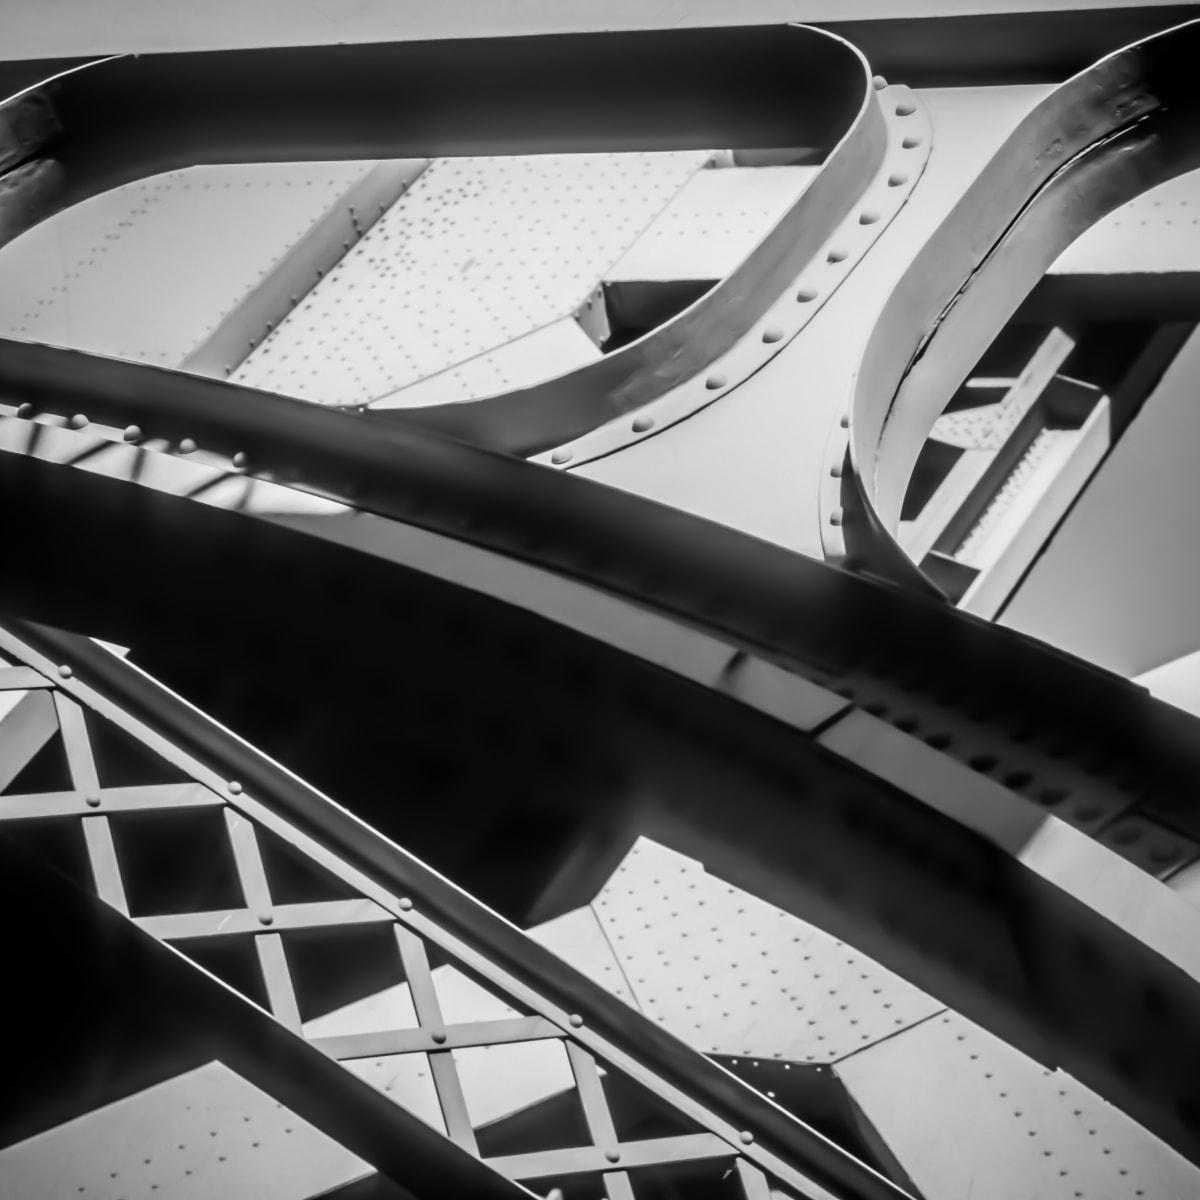 Tower Bridge #2 by Farrell Scott